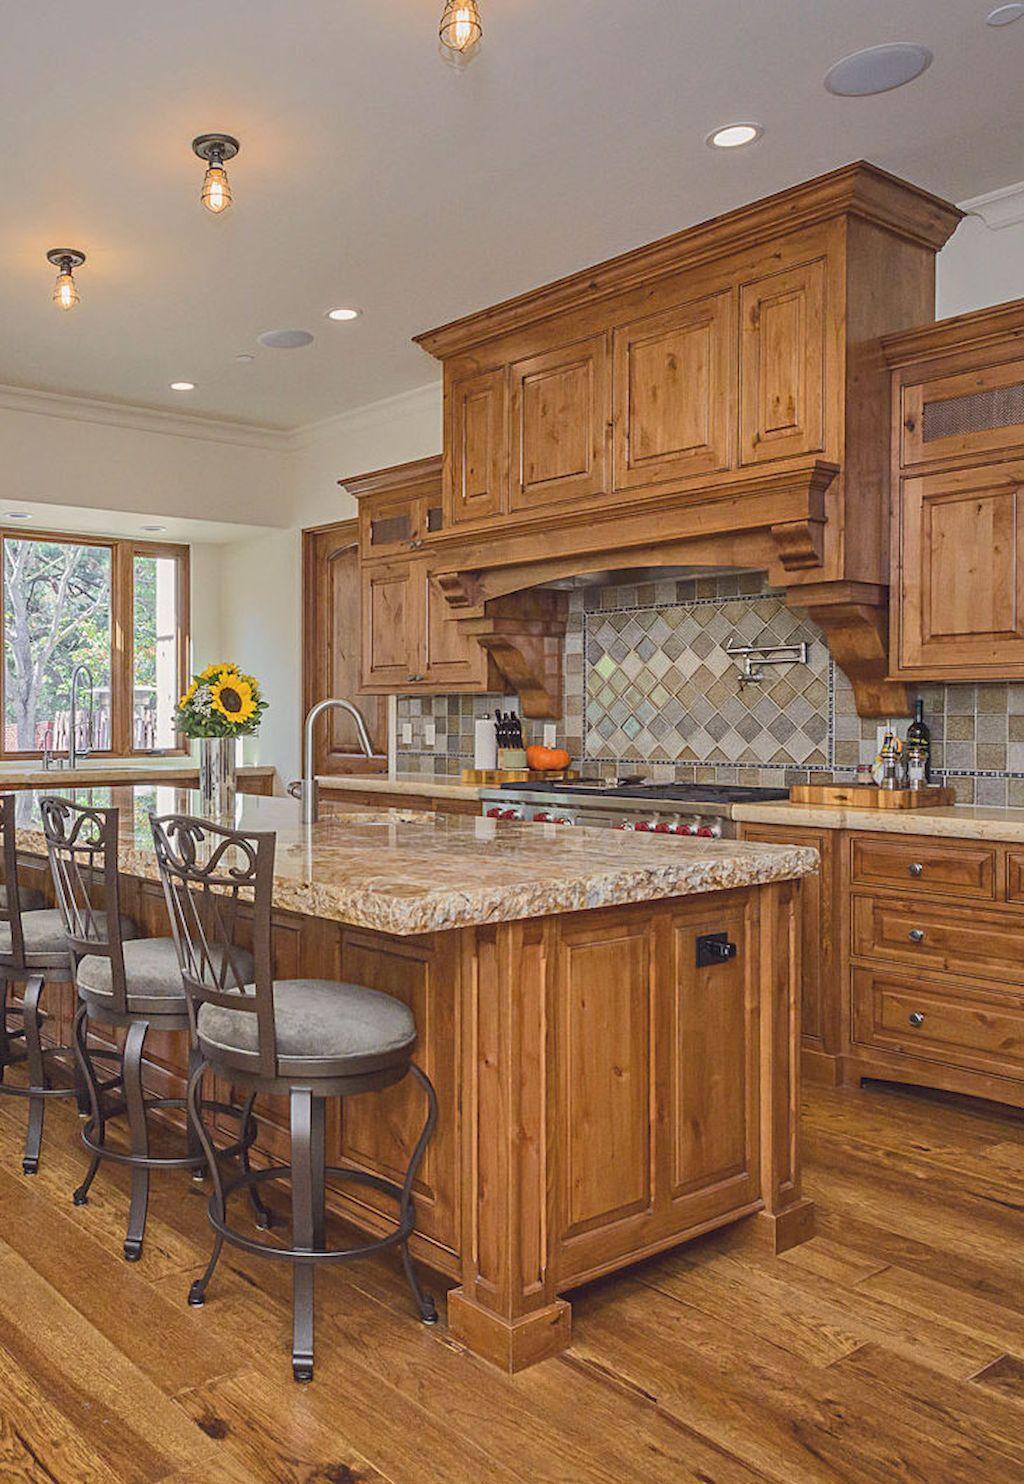 70 tile floor farmhouse kitchen decor ideas hickory flooring on farmhouse kitchen flooring id=91532